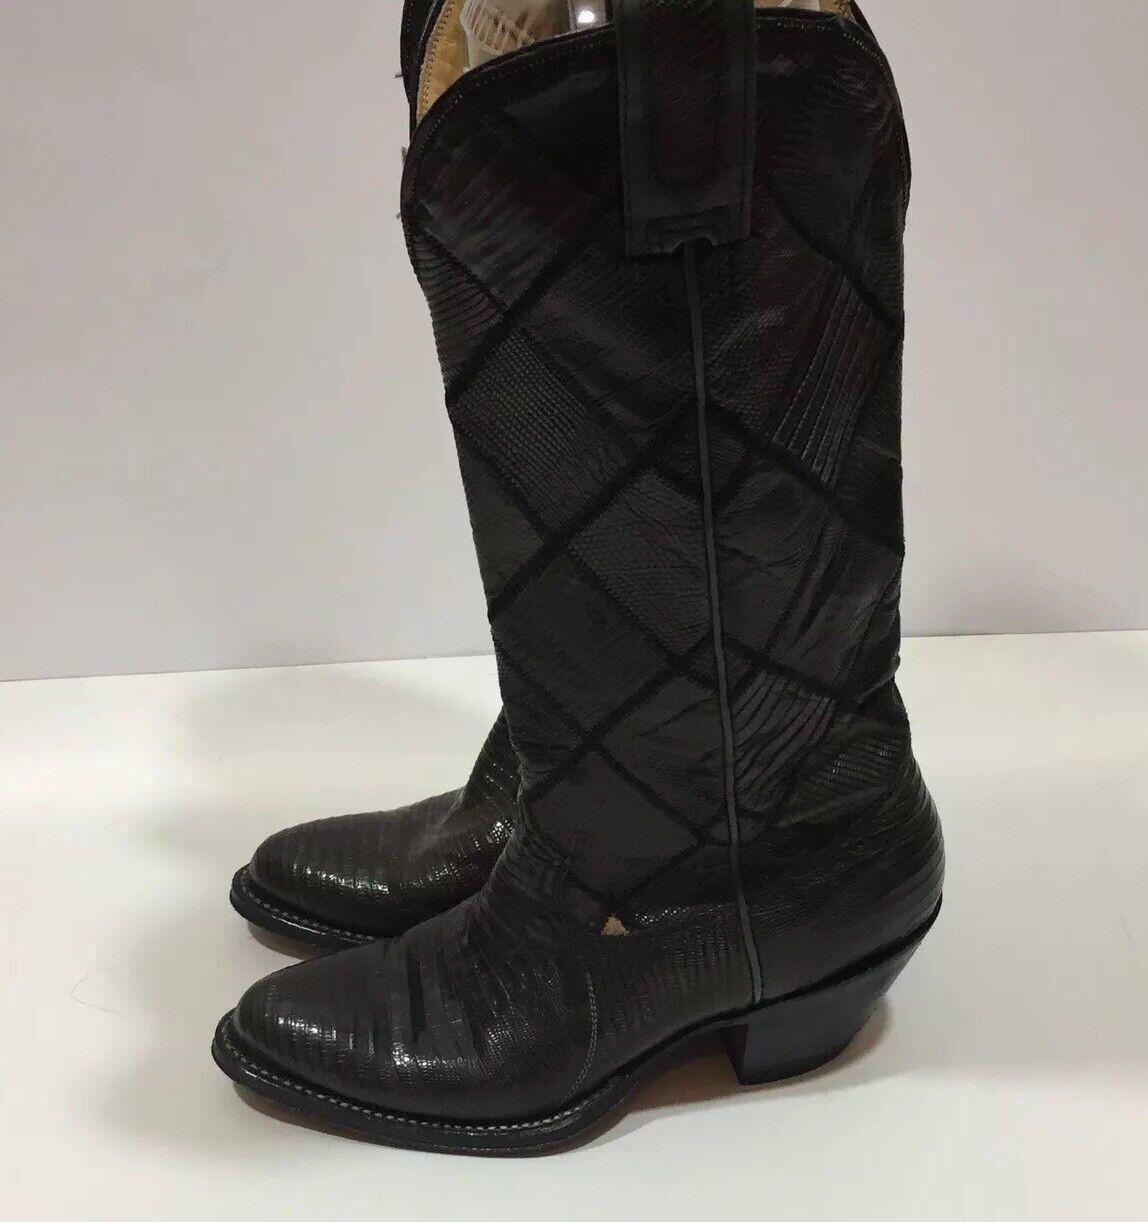 WOMENS MONTANA COWBOY BOOTS BLACK WESTERN COWGIRL RODEO Sz 6.5 USA